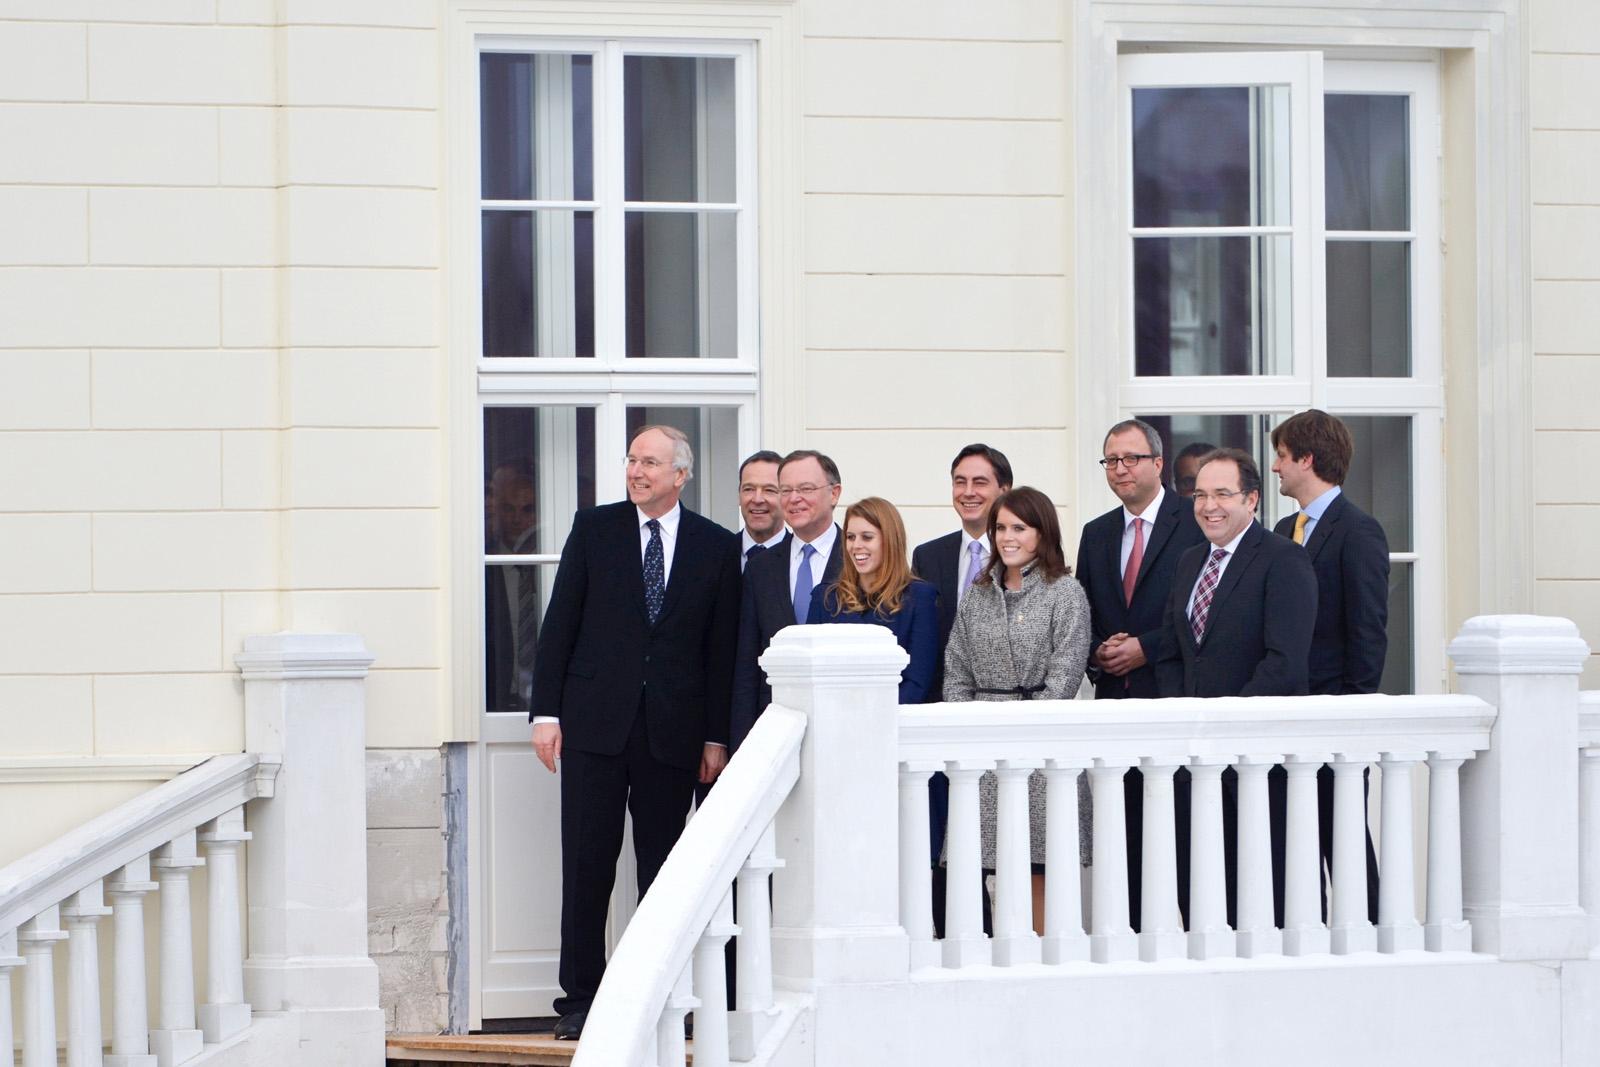 balkon_gruppe